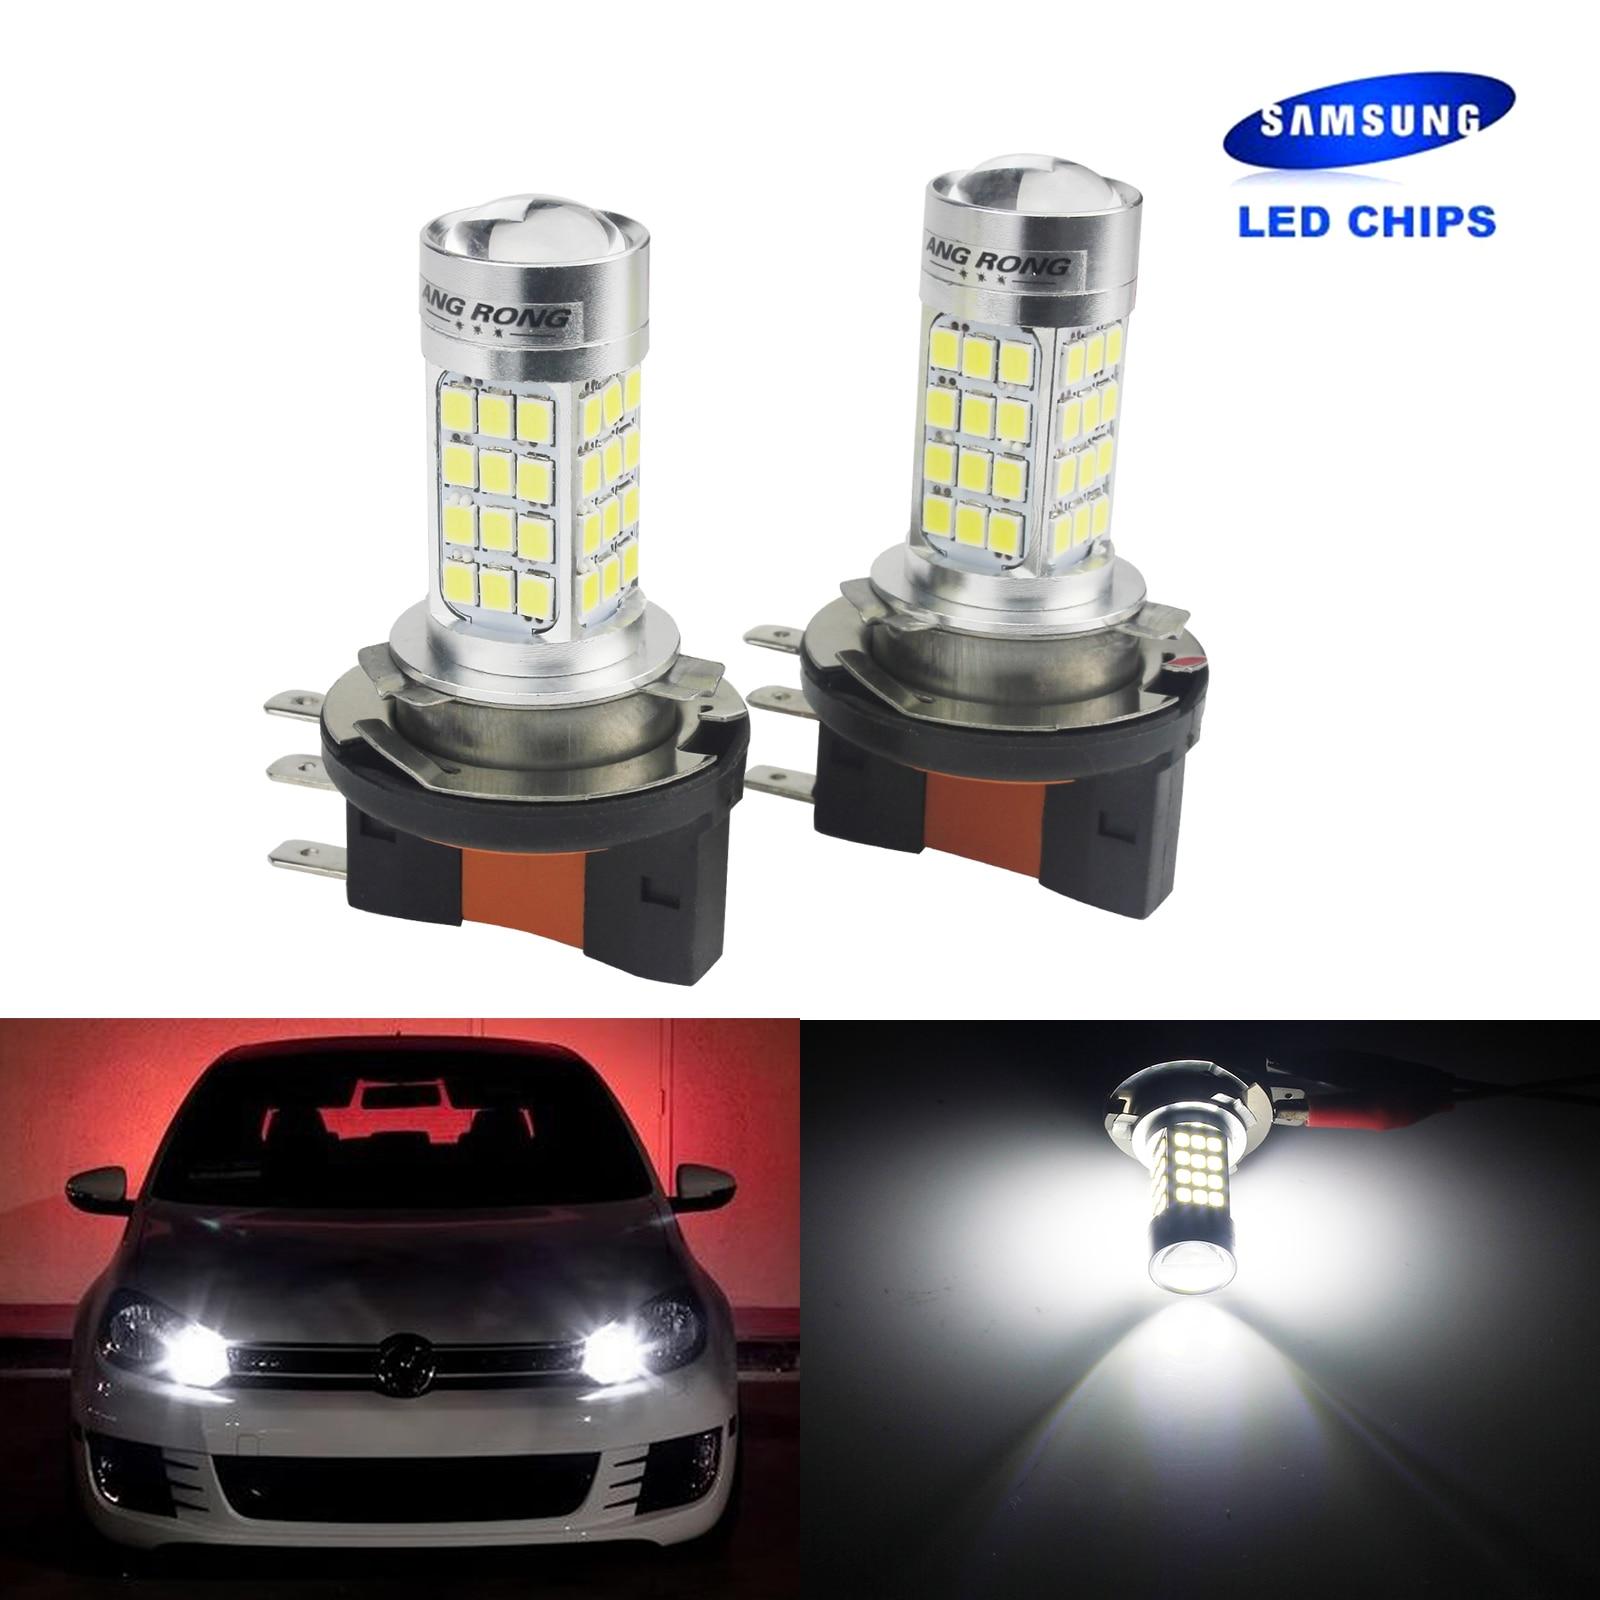 ANGRONG 2x H15 64176 Bulbs SAMSUNG LED Daytime Running Light For VW Golf GTI MK6 MK7 2008+ источник света для авто 2 vw mk6 80w h15 cree 450lm 12v